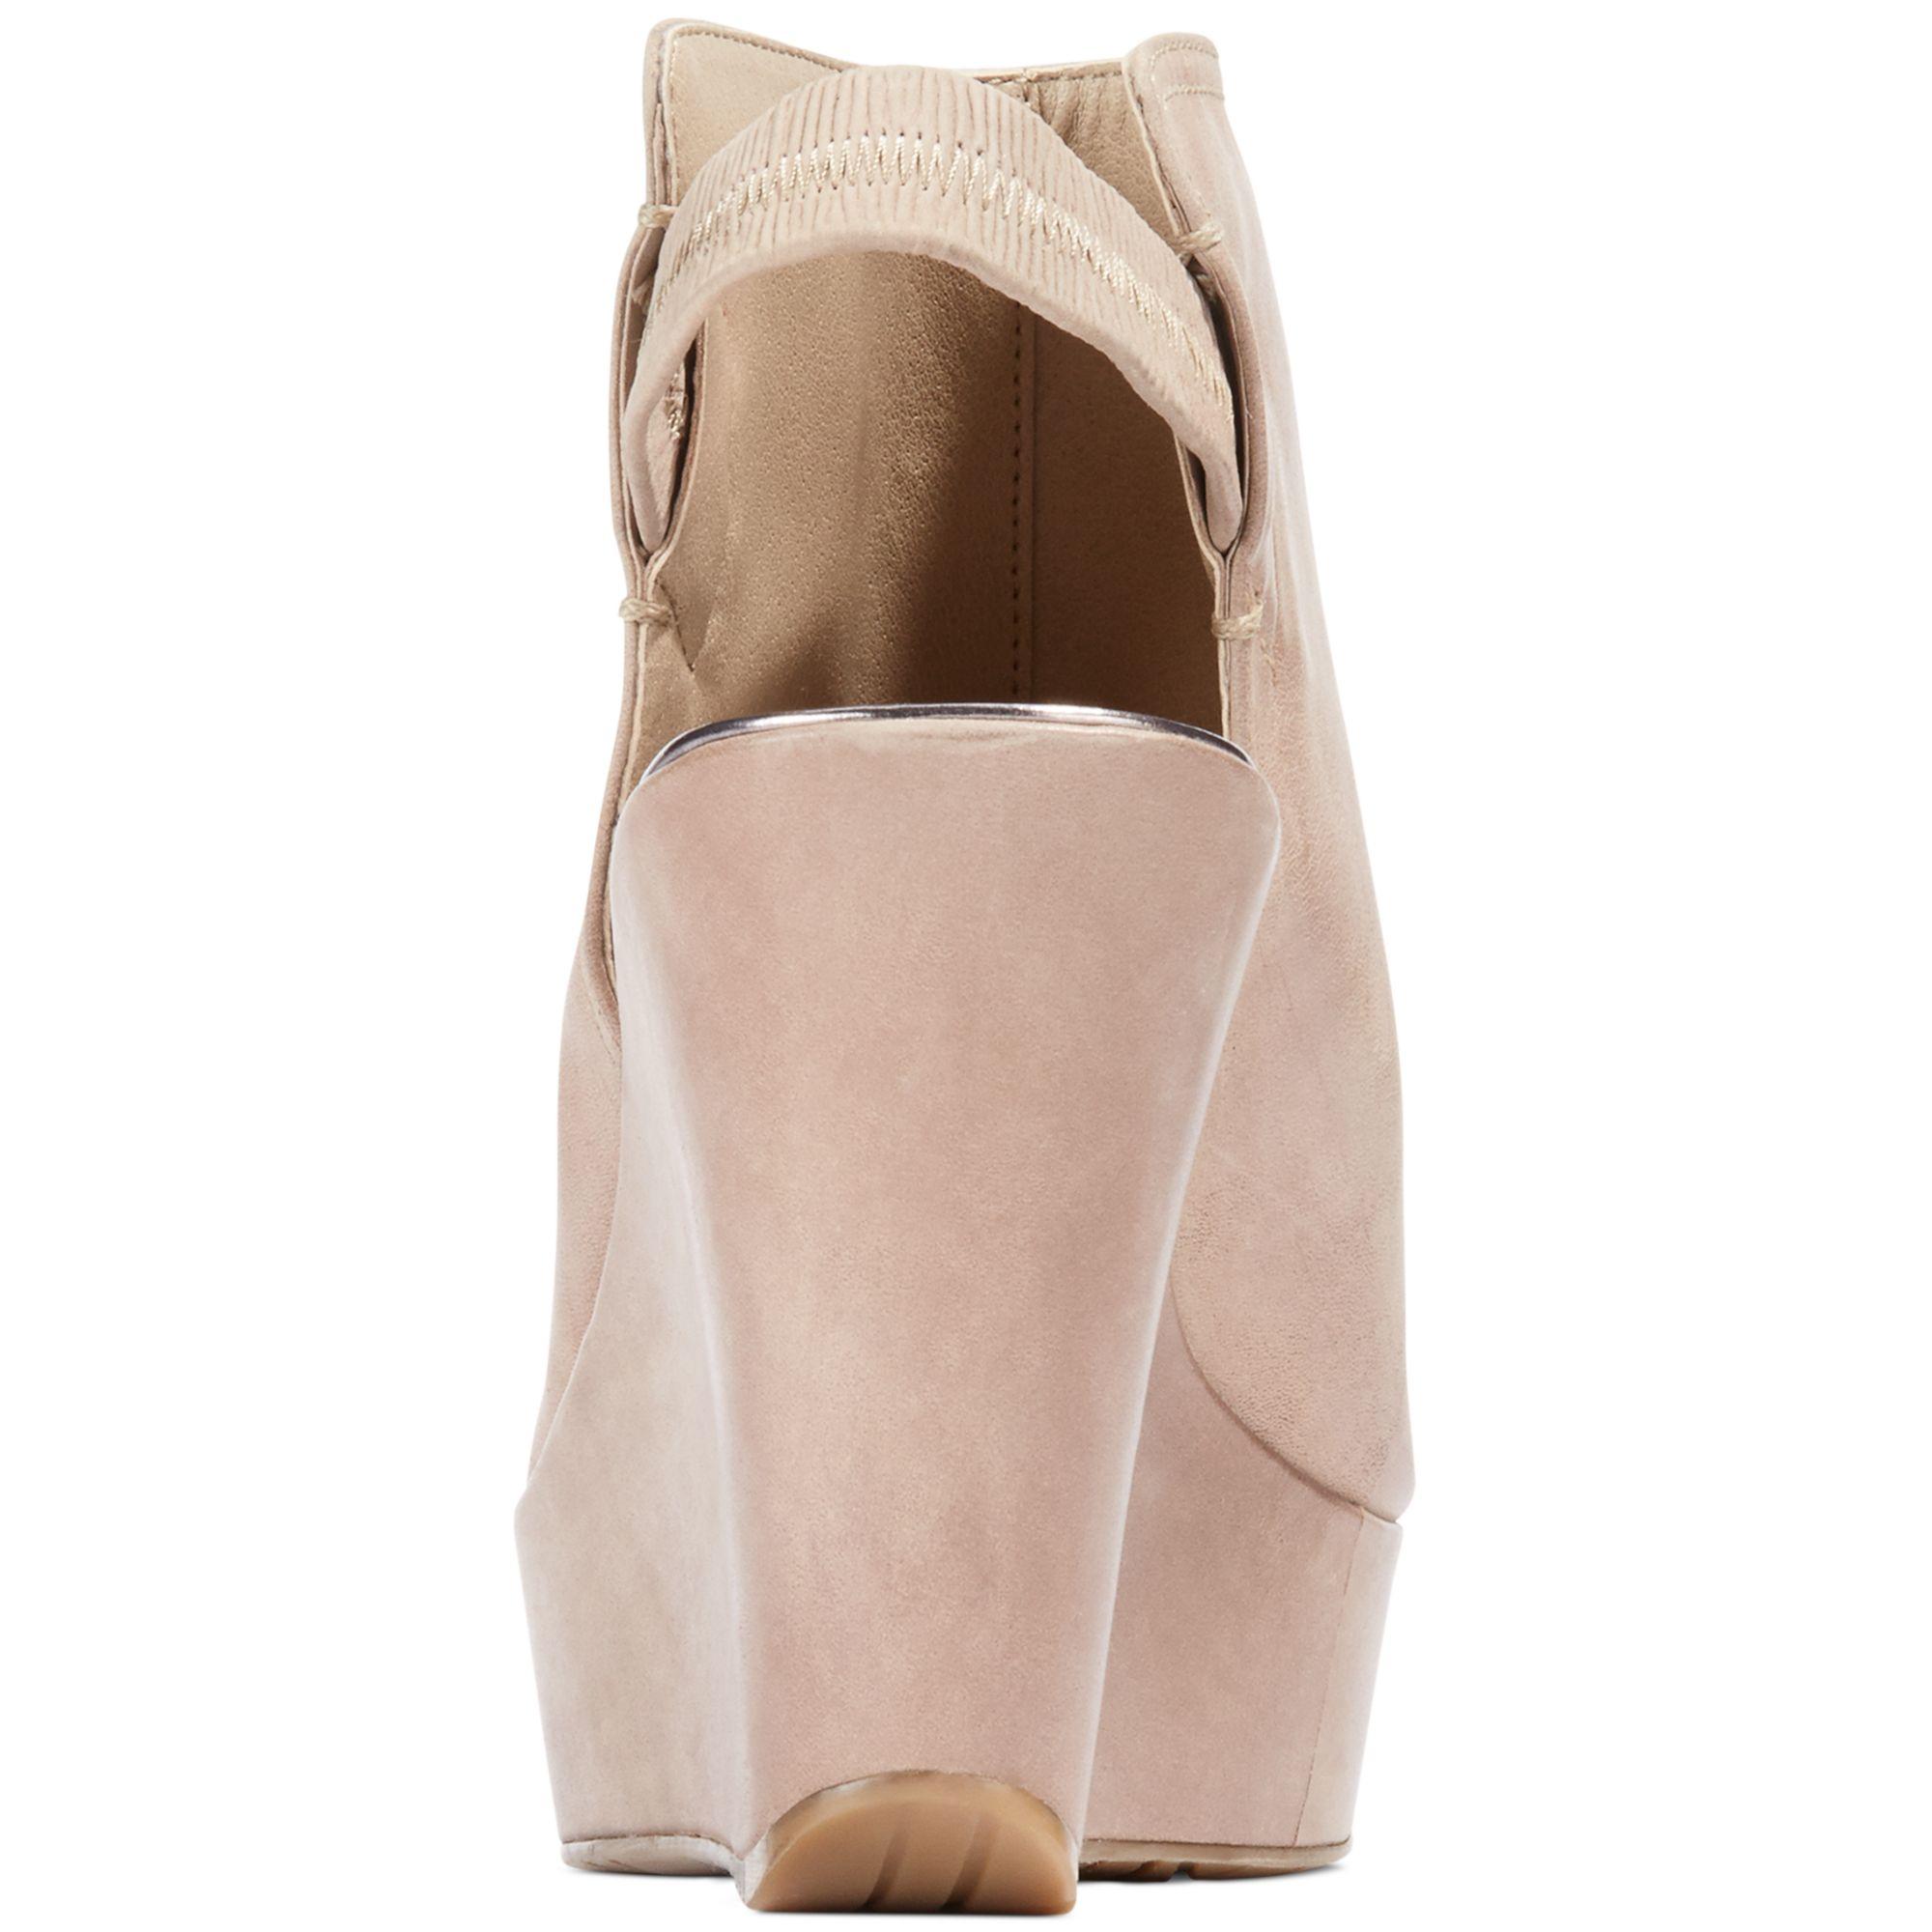 Work Shoes Womens In Sam S Club